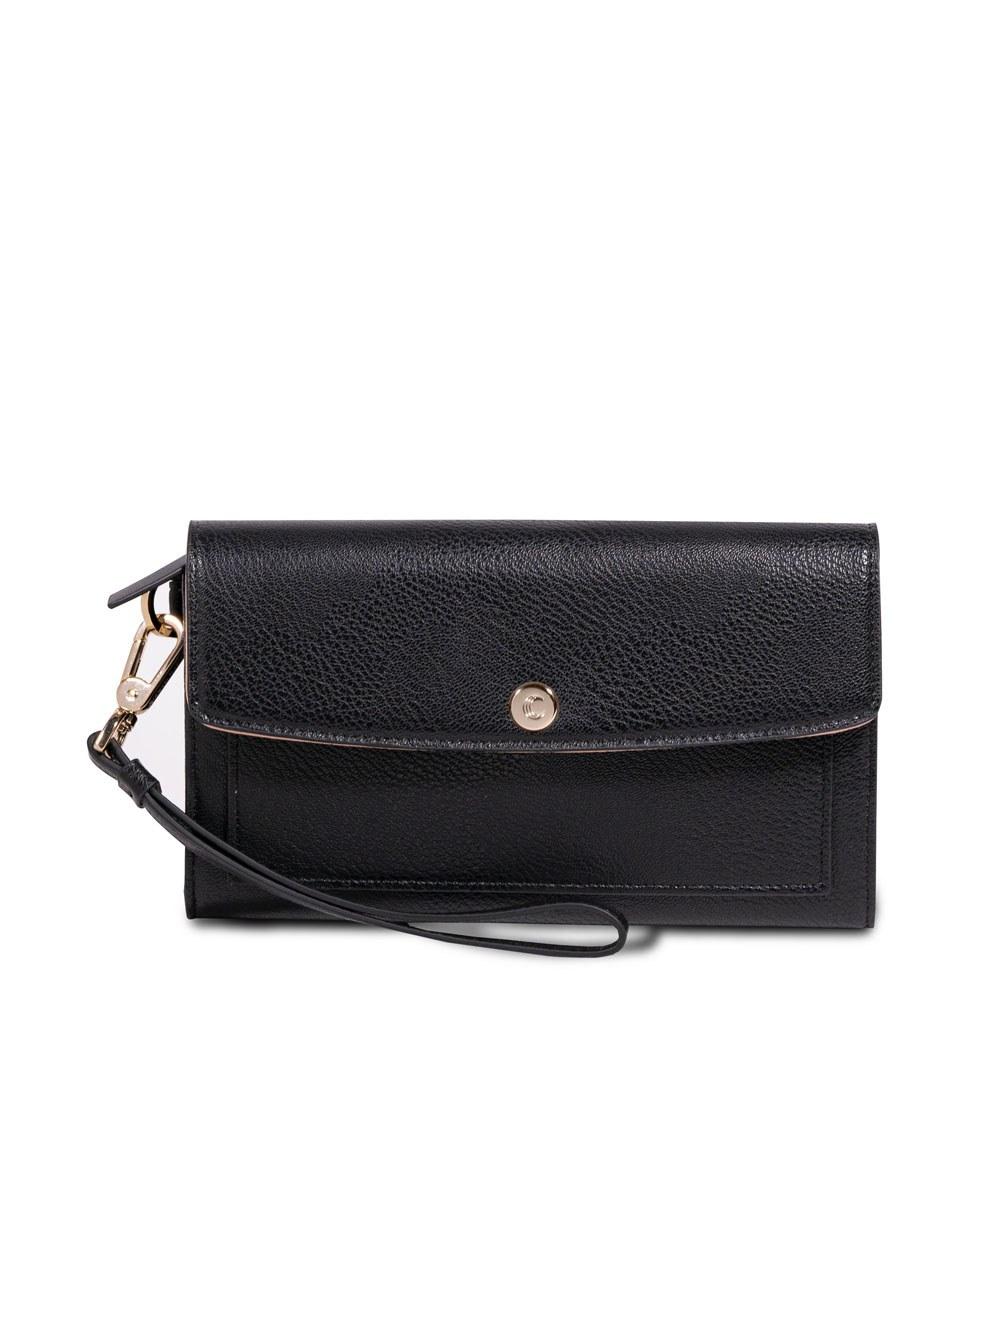 Wallet With Wristlet - Black